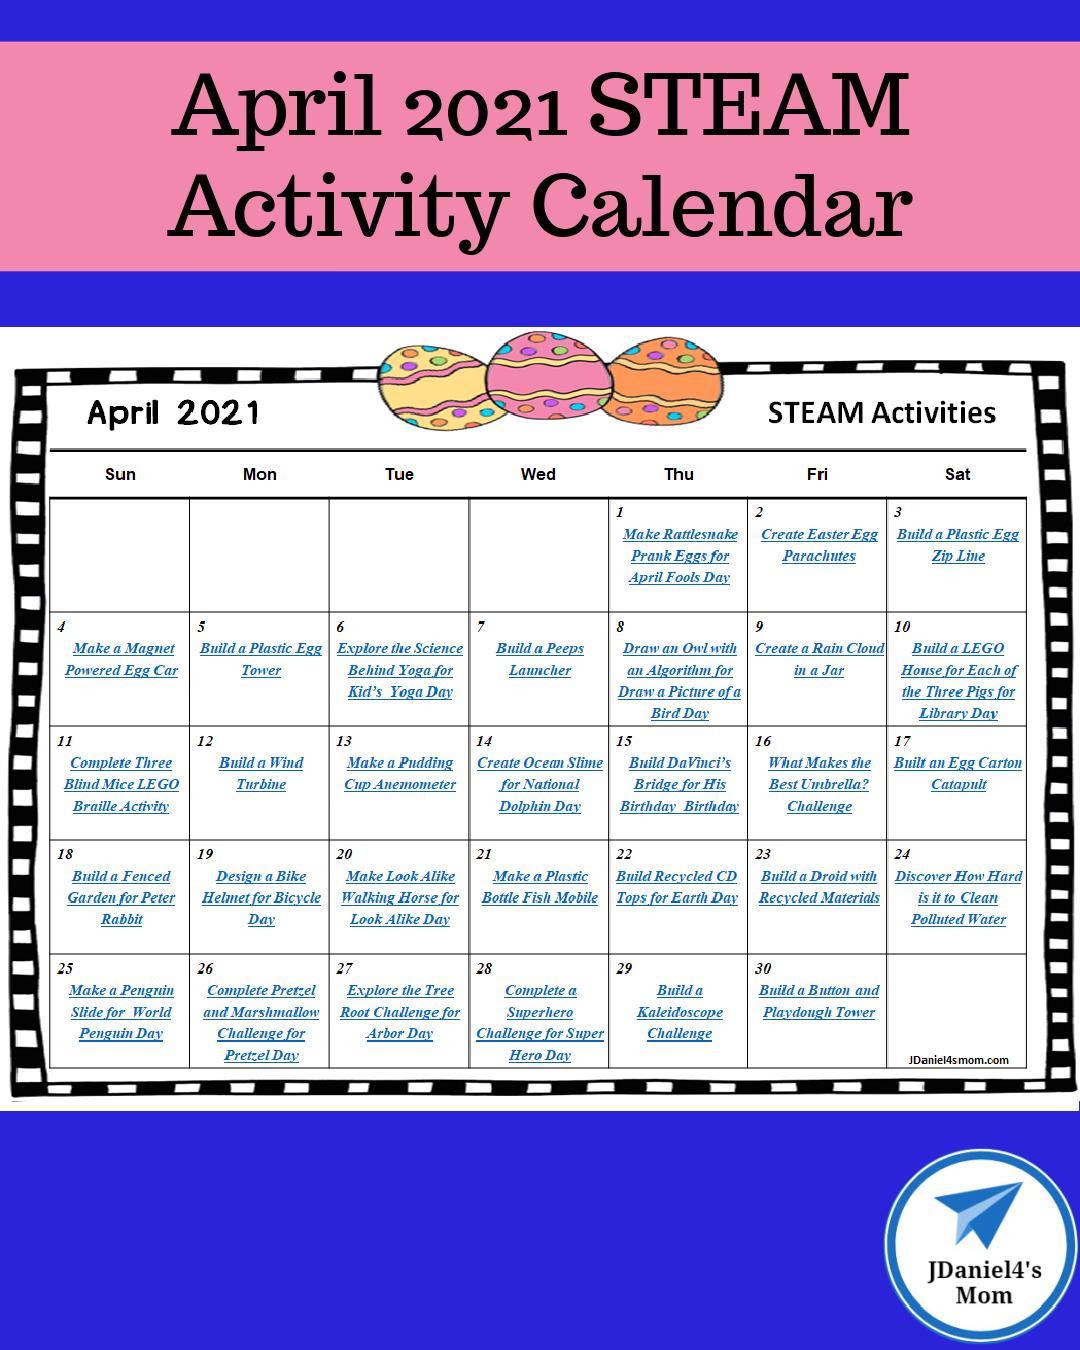 April 2021 STEAM Activity Calendar